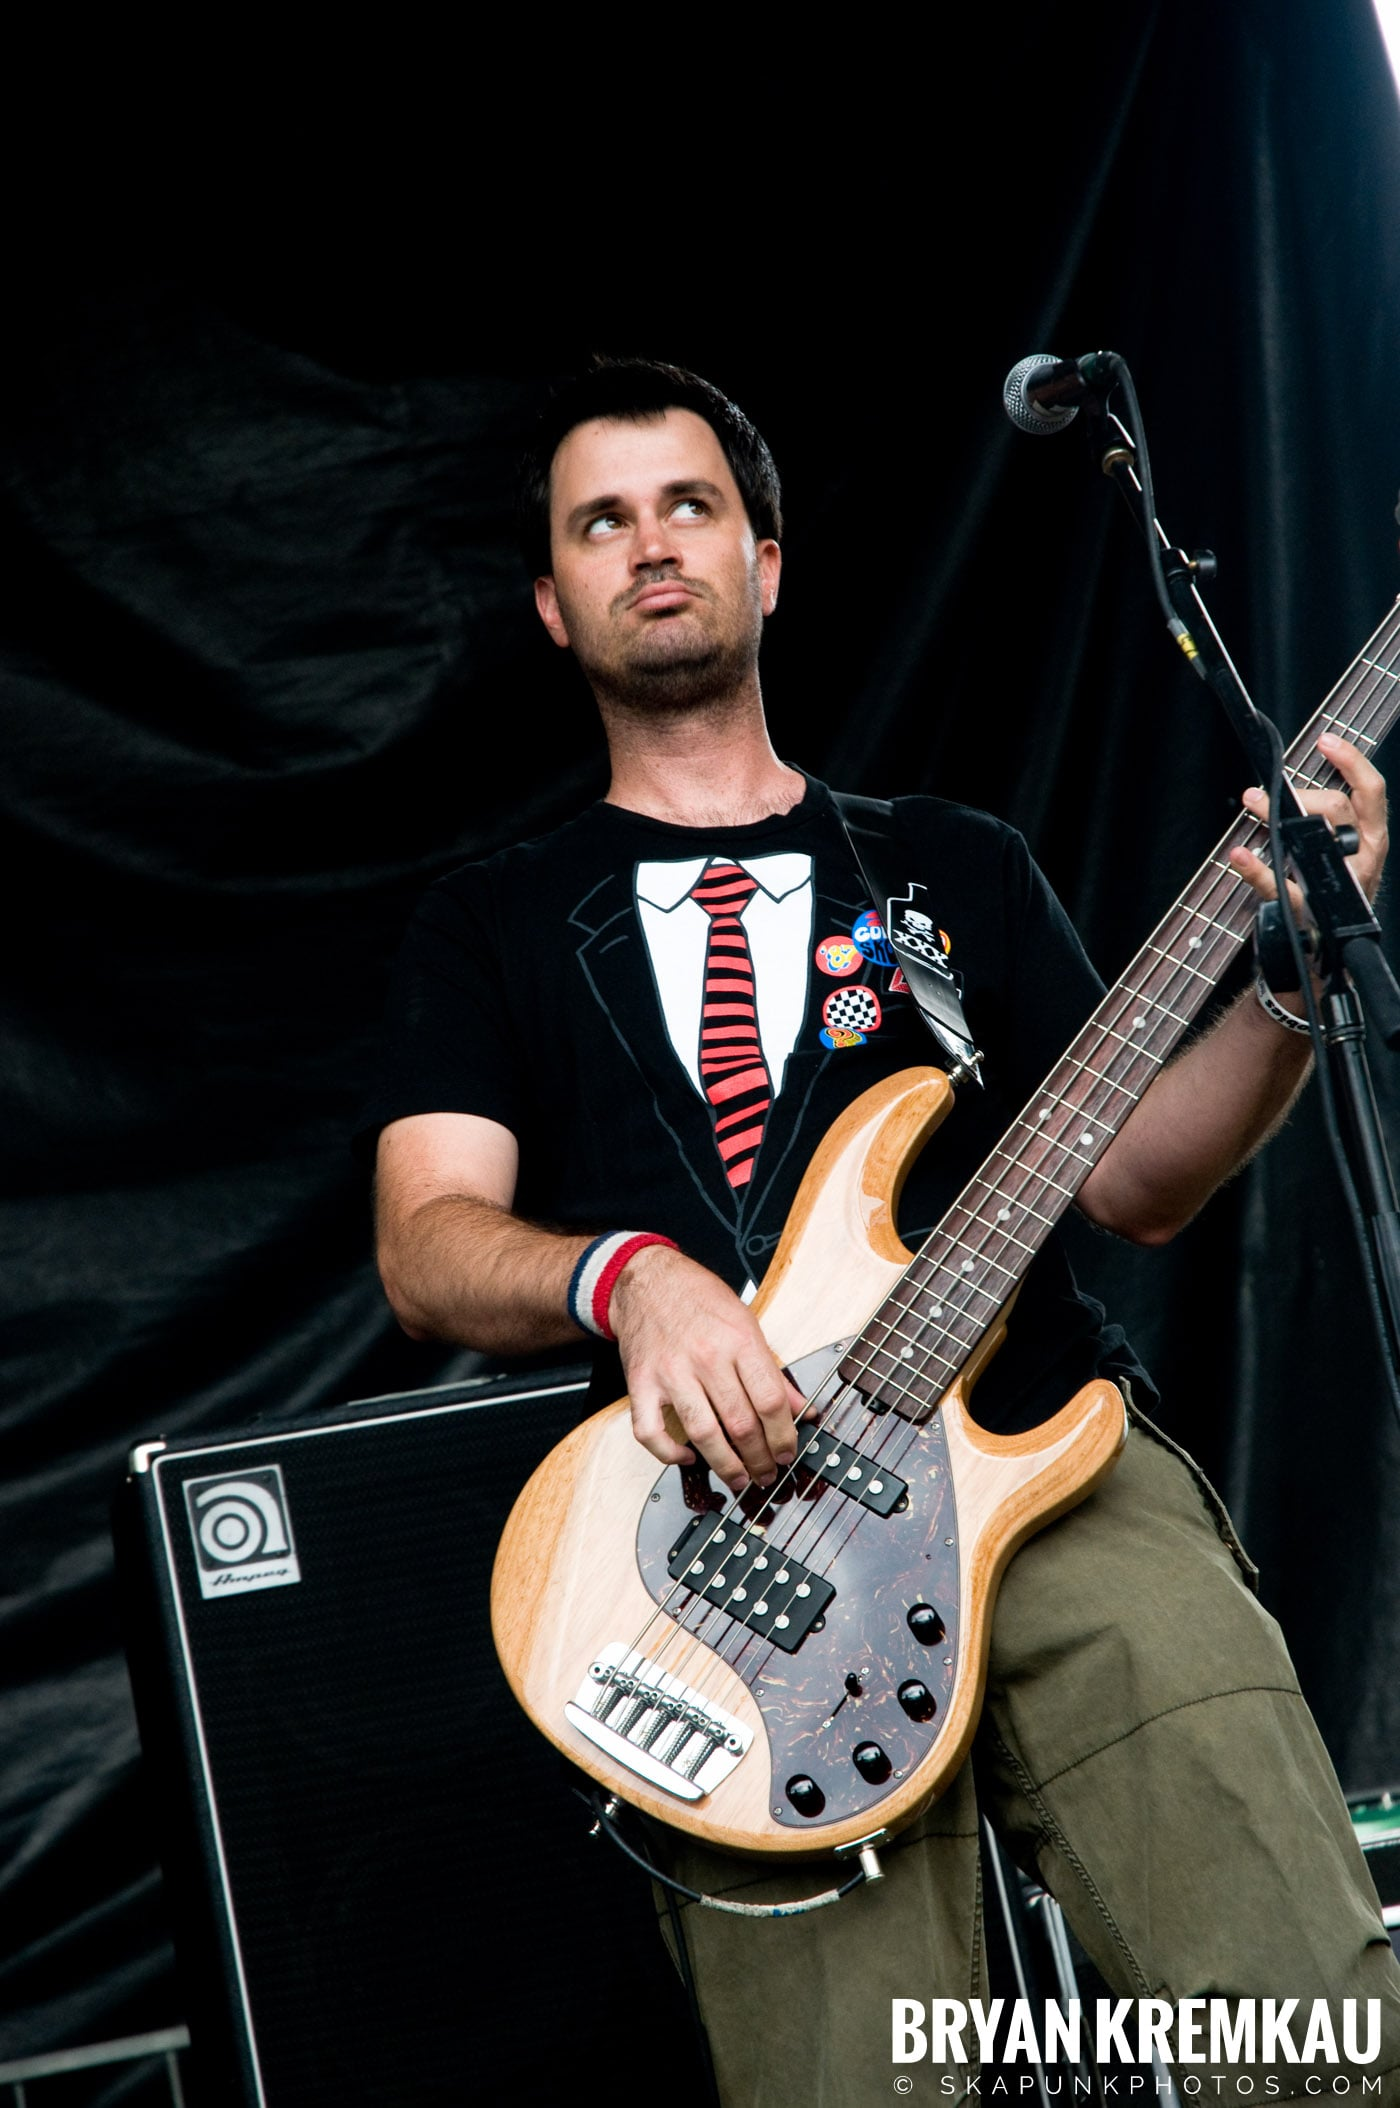 Reel Big Fish @ Warped Tour 08, Scranton PA - 7.27.08 (16)